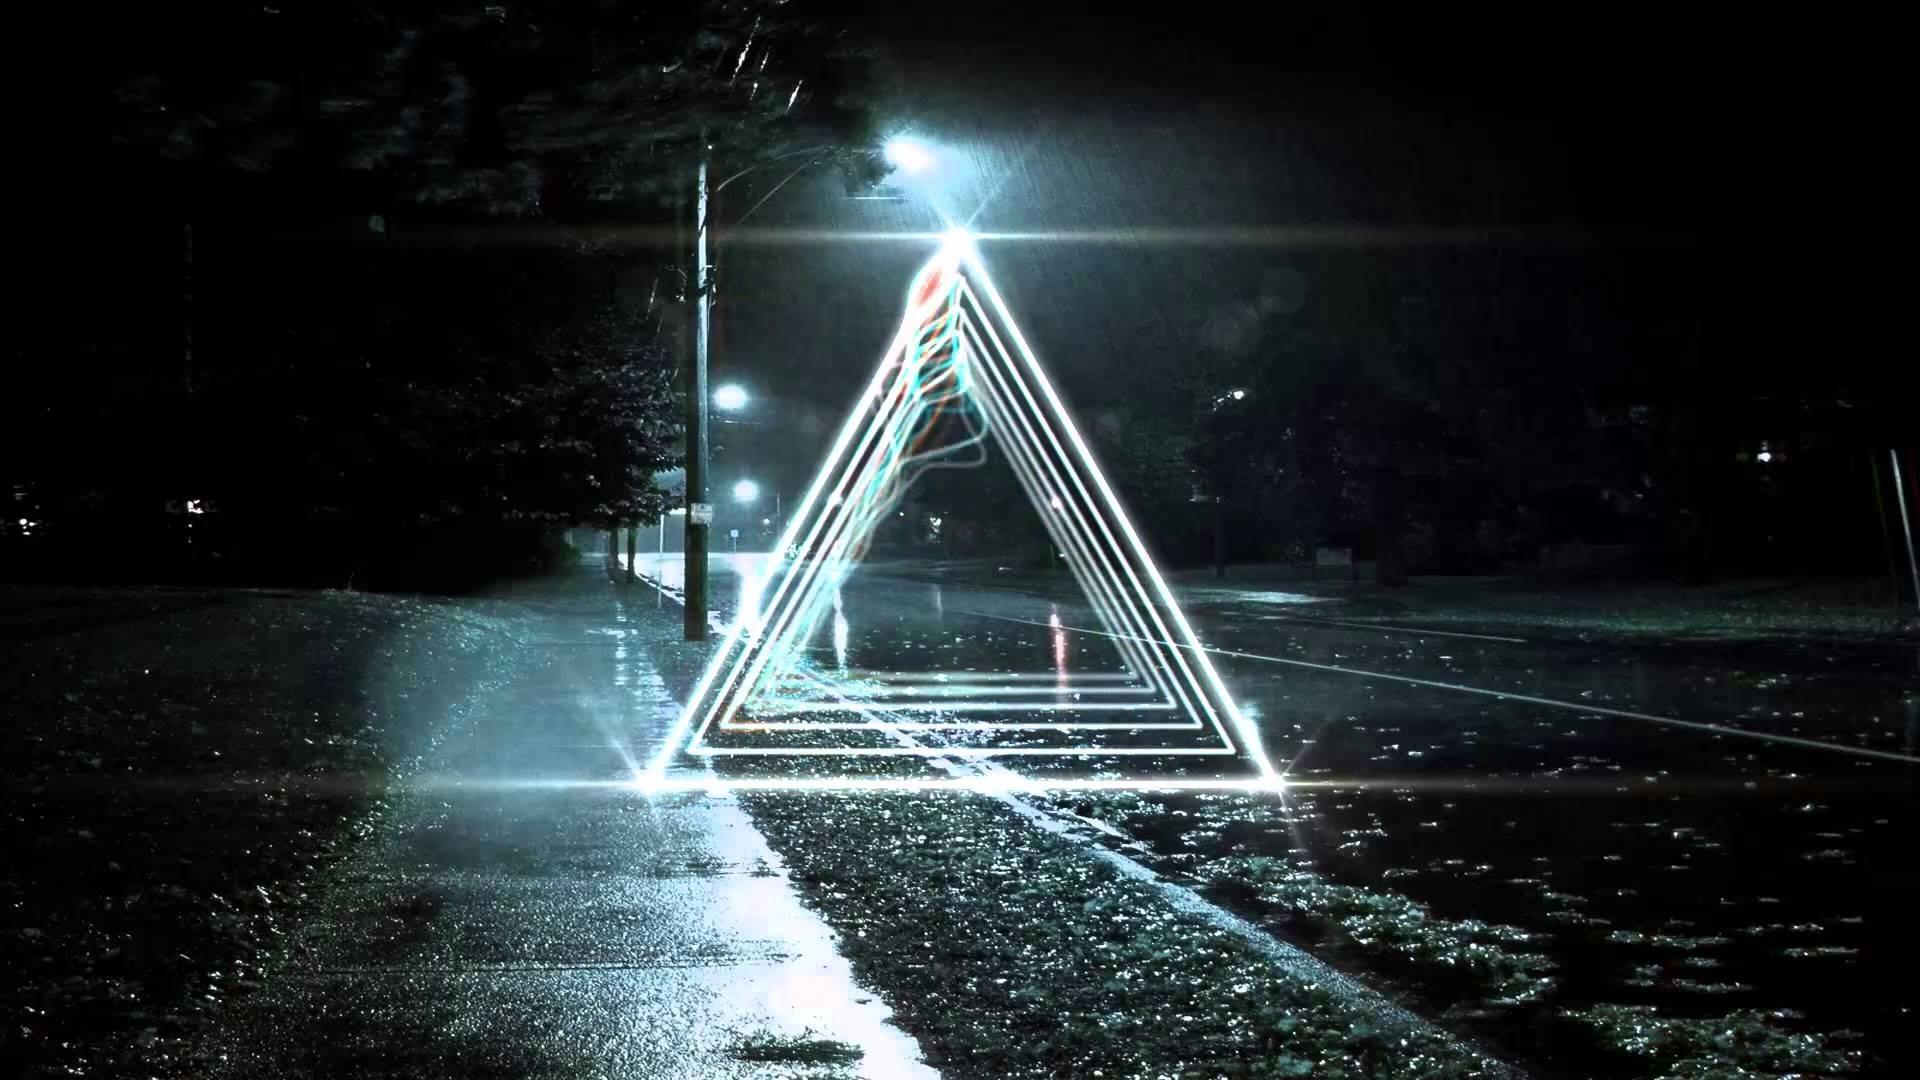 ZHU – Faded (Trumpdisco remix) | ELECTRO HOUSE